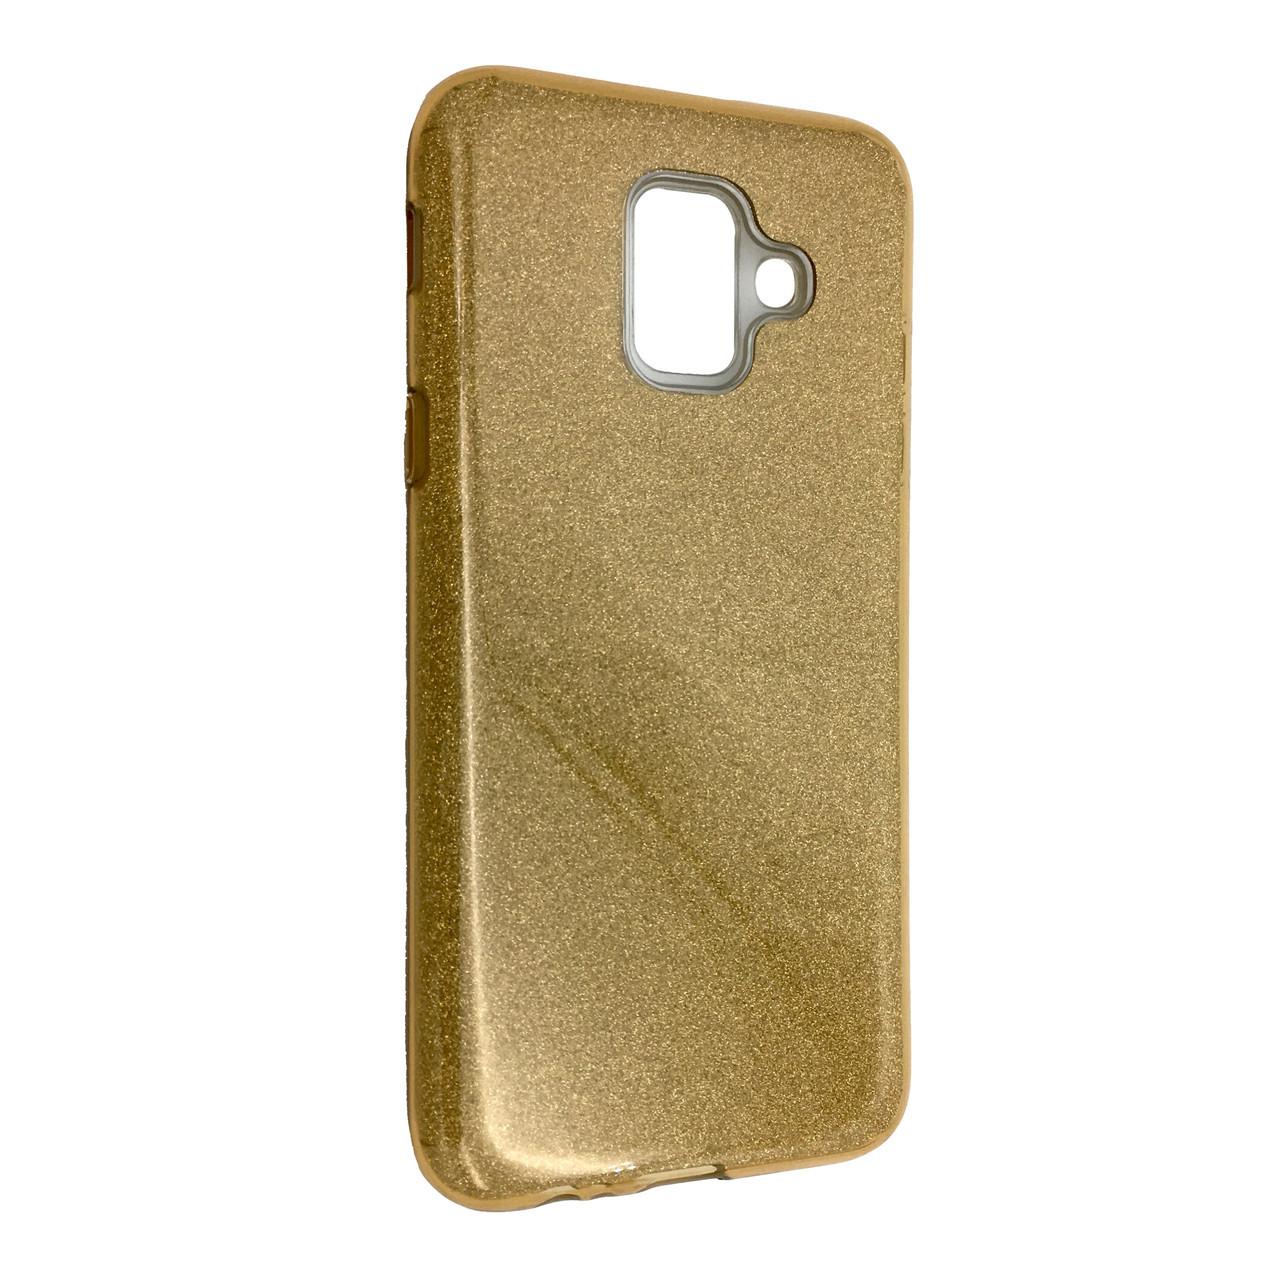 Чохол Silicone Glitter Heaven Rain Samsung J600 (2018) (gold)